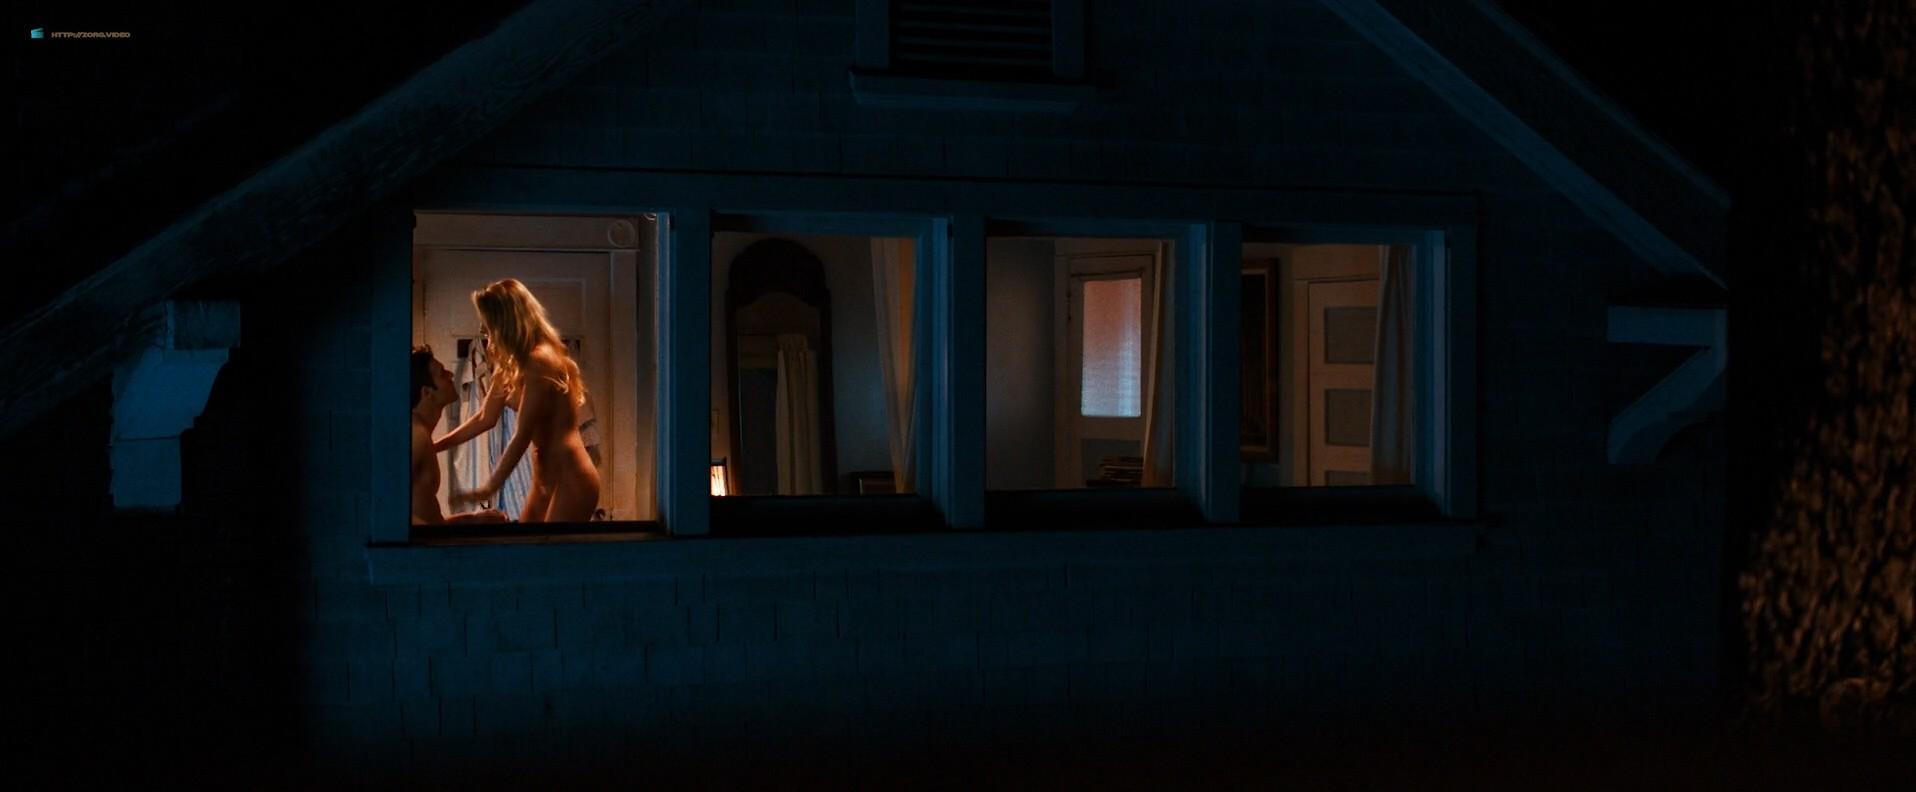 Jennifer Lopez hot sex scene and Lexi Atkins nude sex - The Boy Next Door (2015) HD 1080p (5)